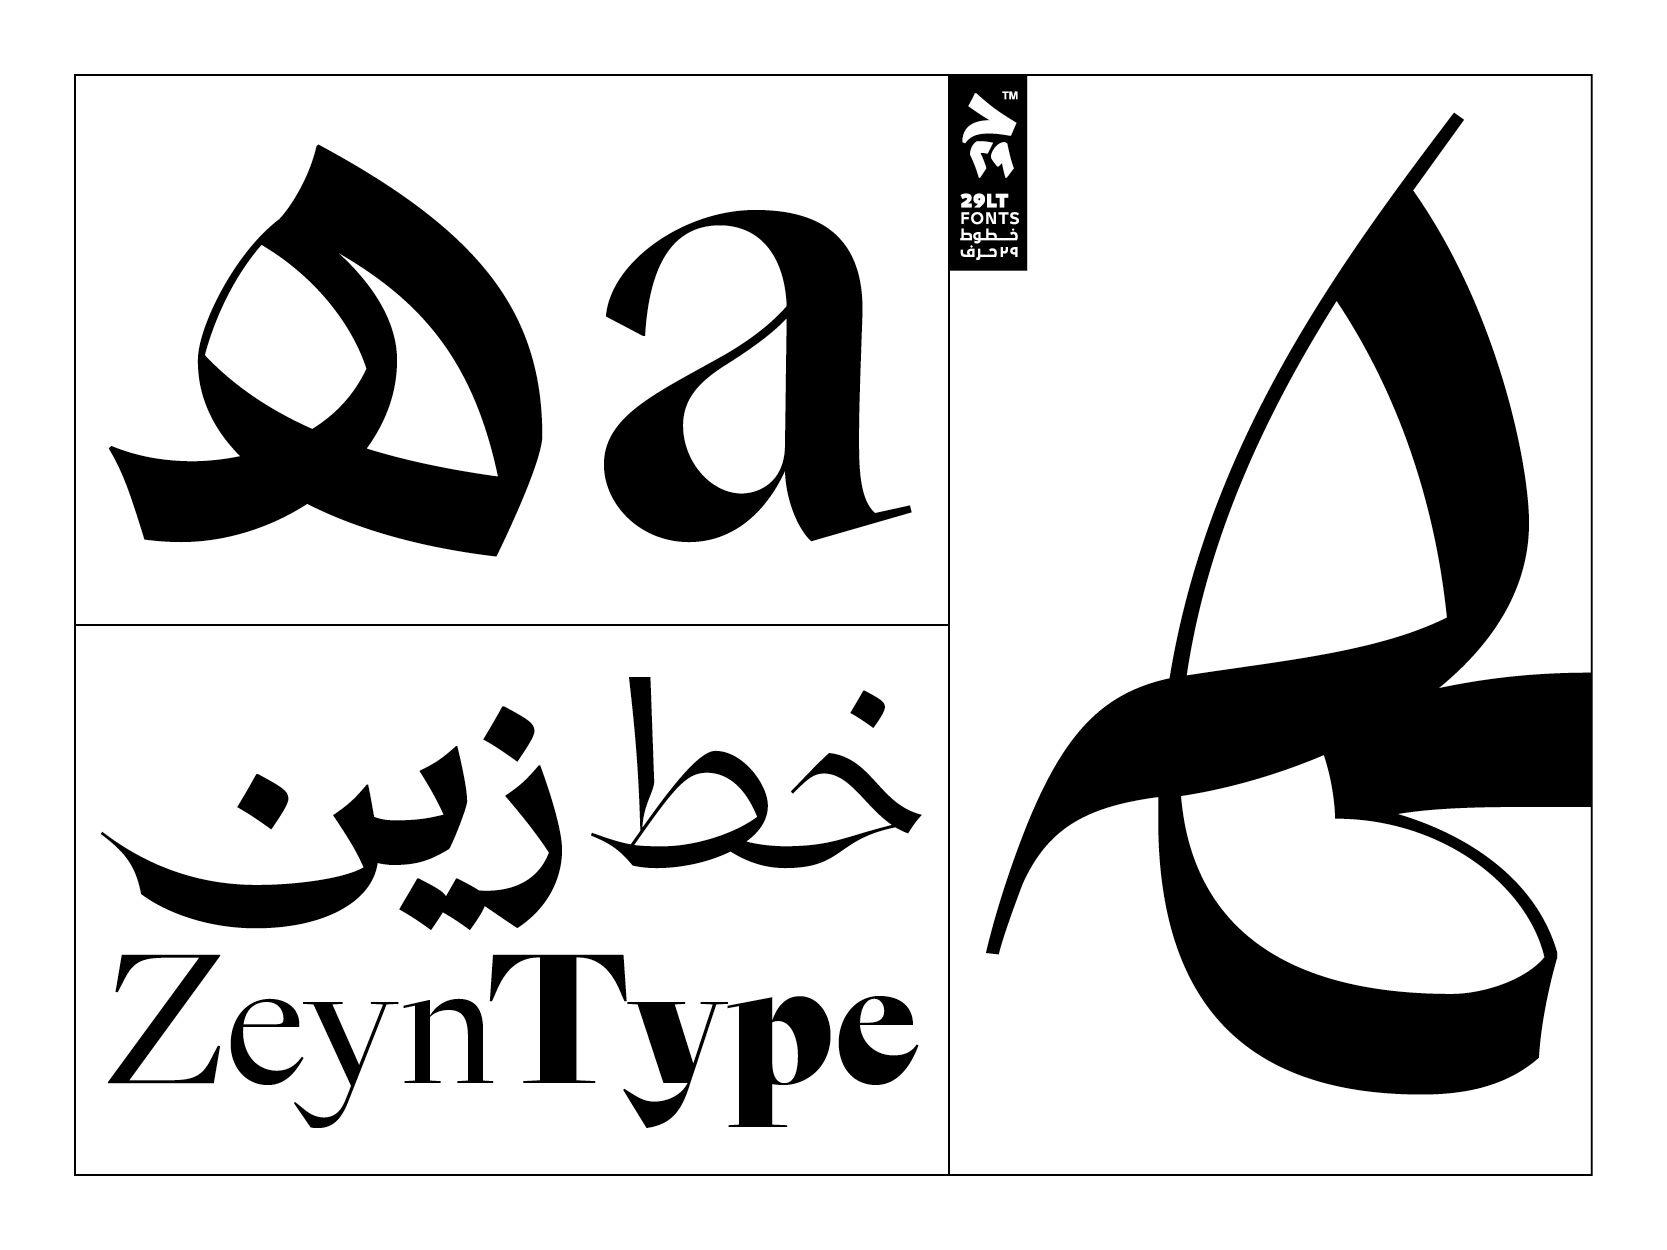 29LT Zeyn Typeface  Name Meaning: Beautiful, elegant, graceful